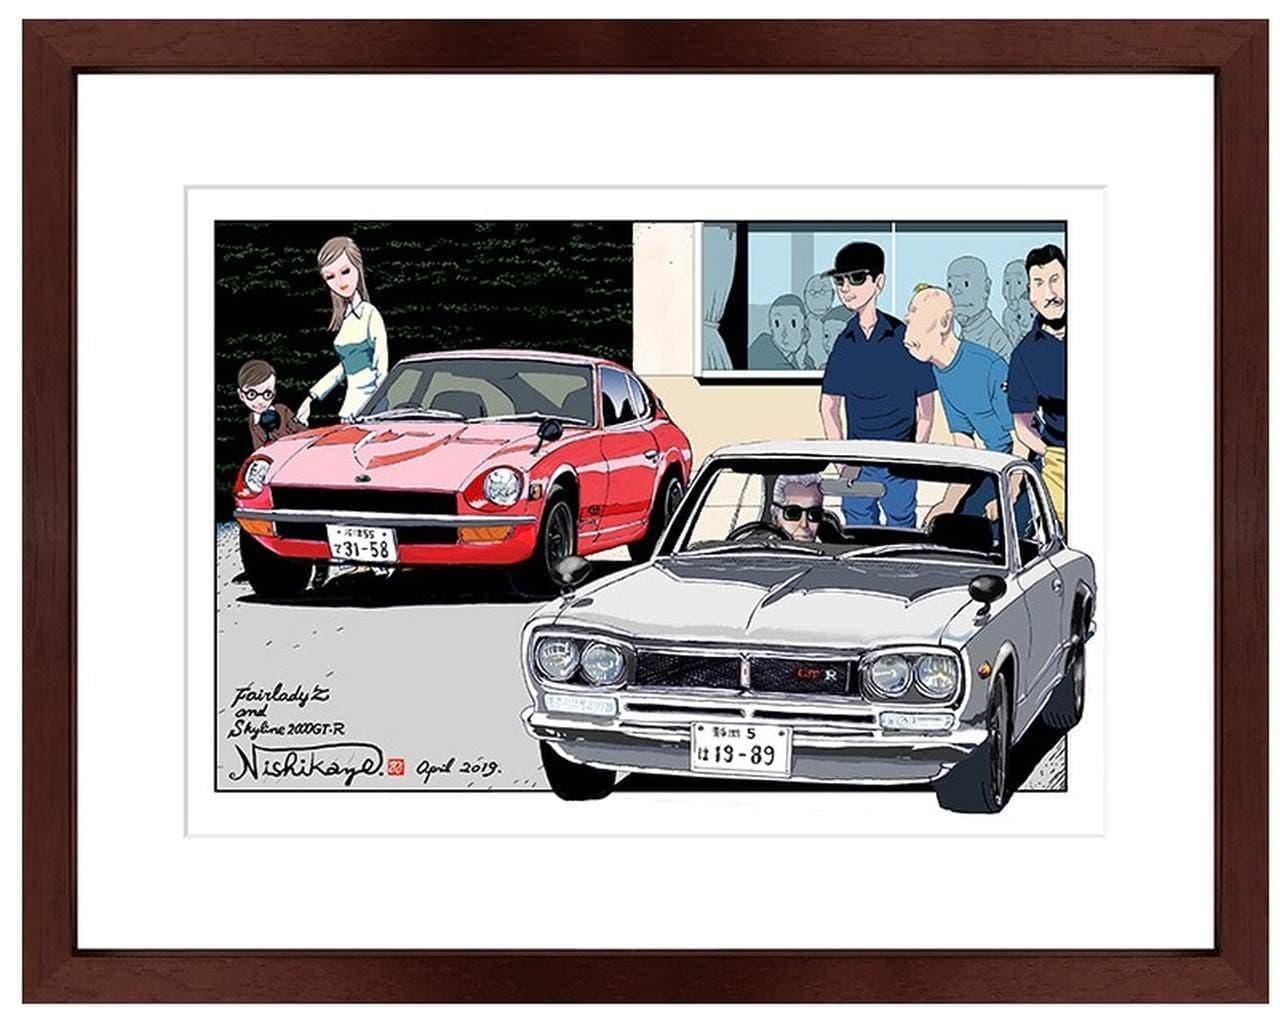 GT-R 50周年を記念した純金プレート、「GT-R・FAIRLADY Z 50thAnniversary inそごう横浜店」で販売